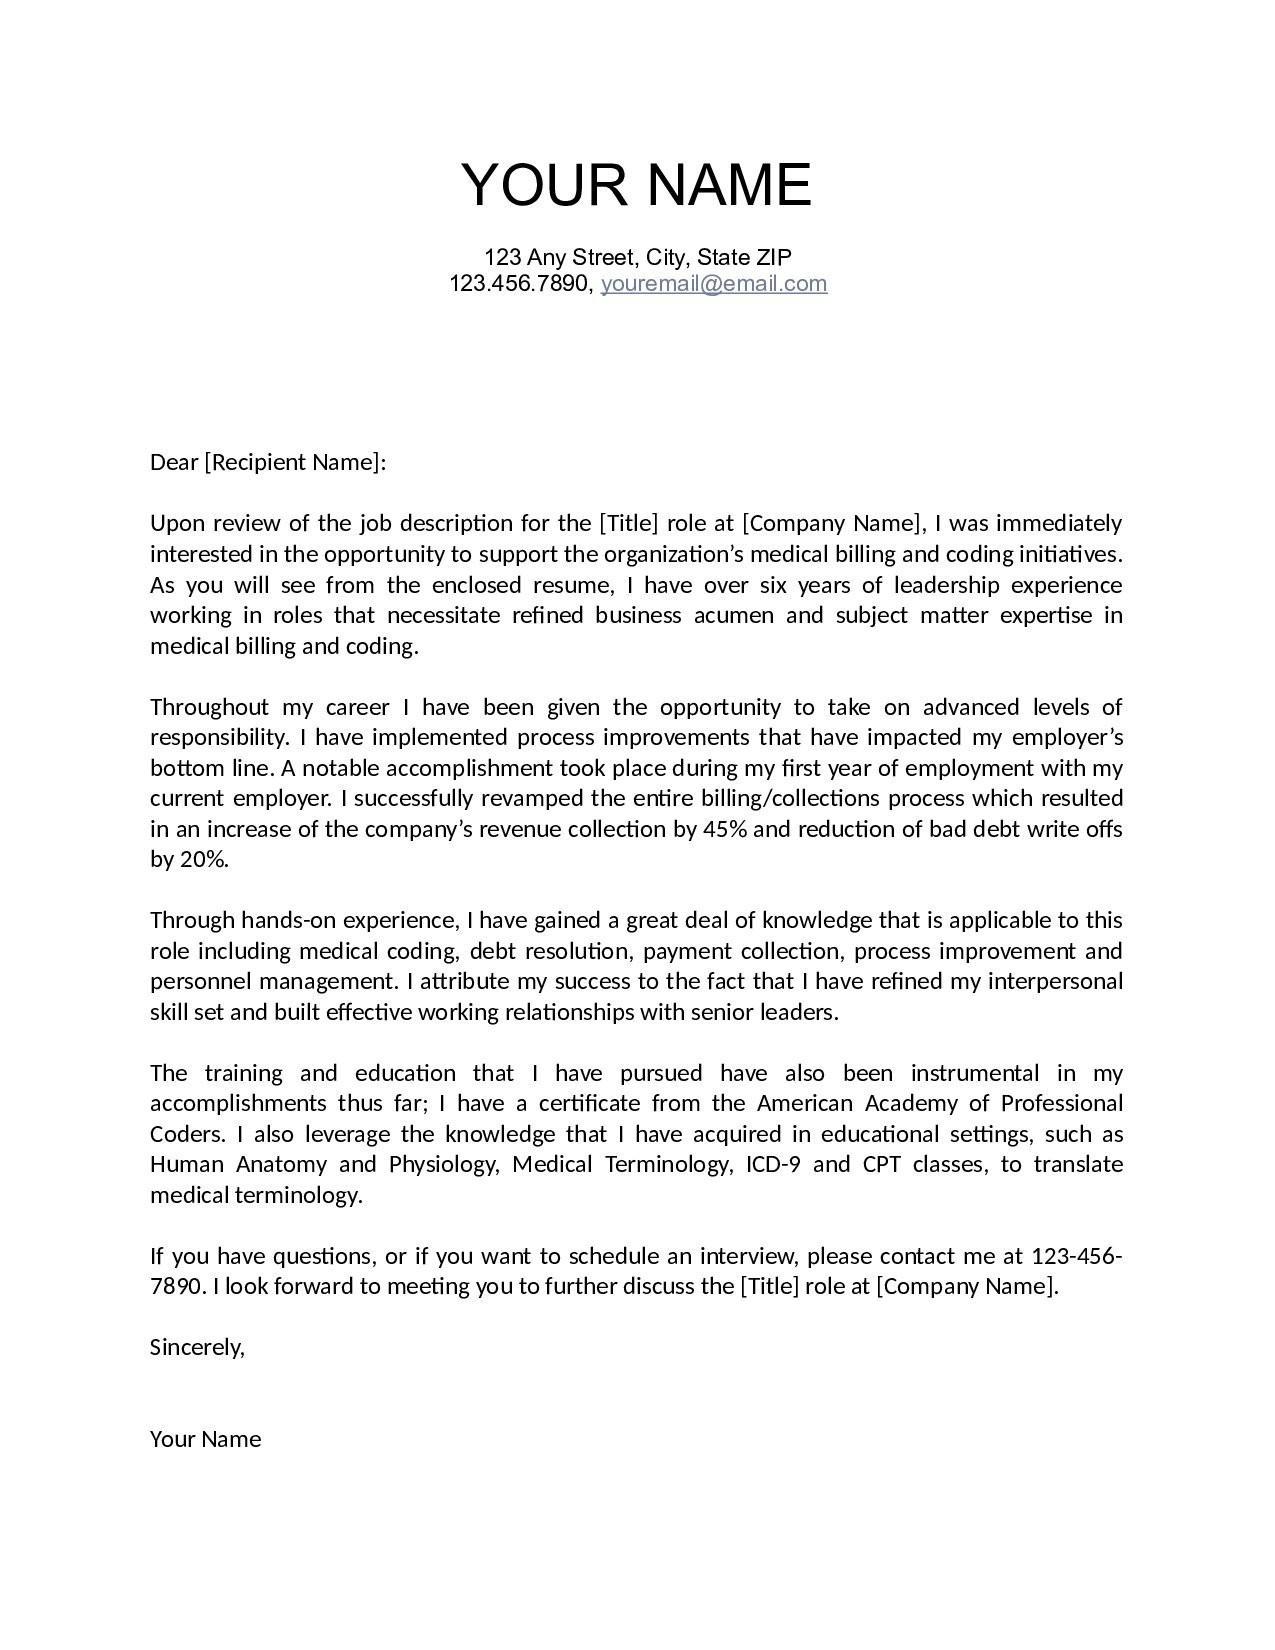 template letter of interest example-Letter Interest Email Template Letter Interest for Job New Cover Letter Examples for Internship 11-o